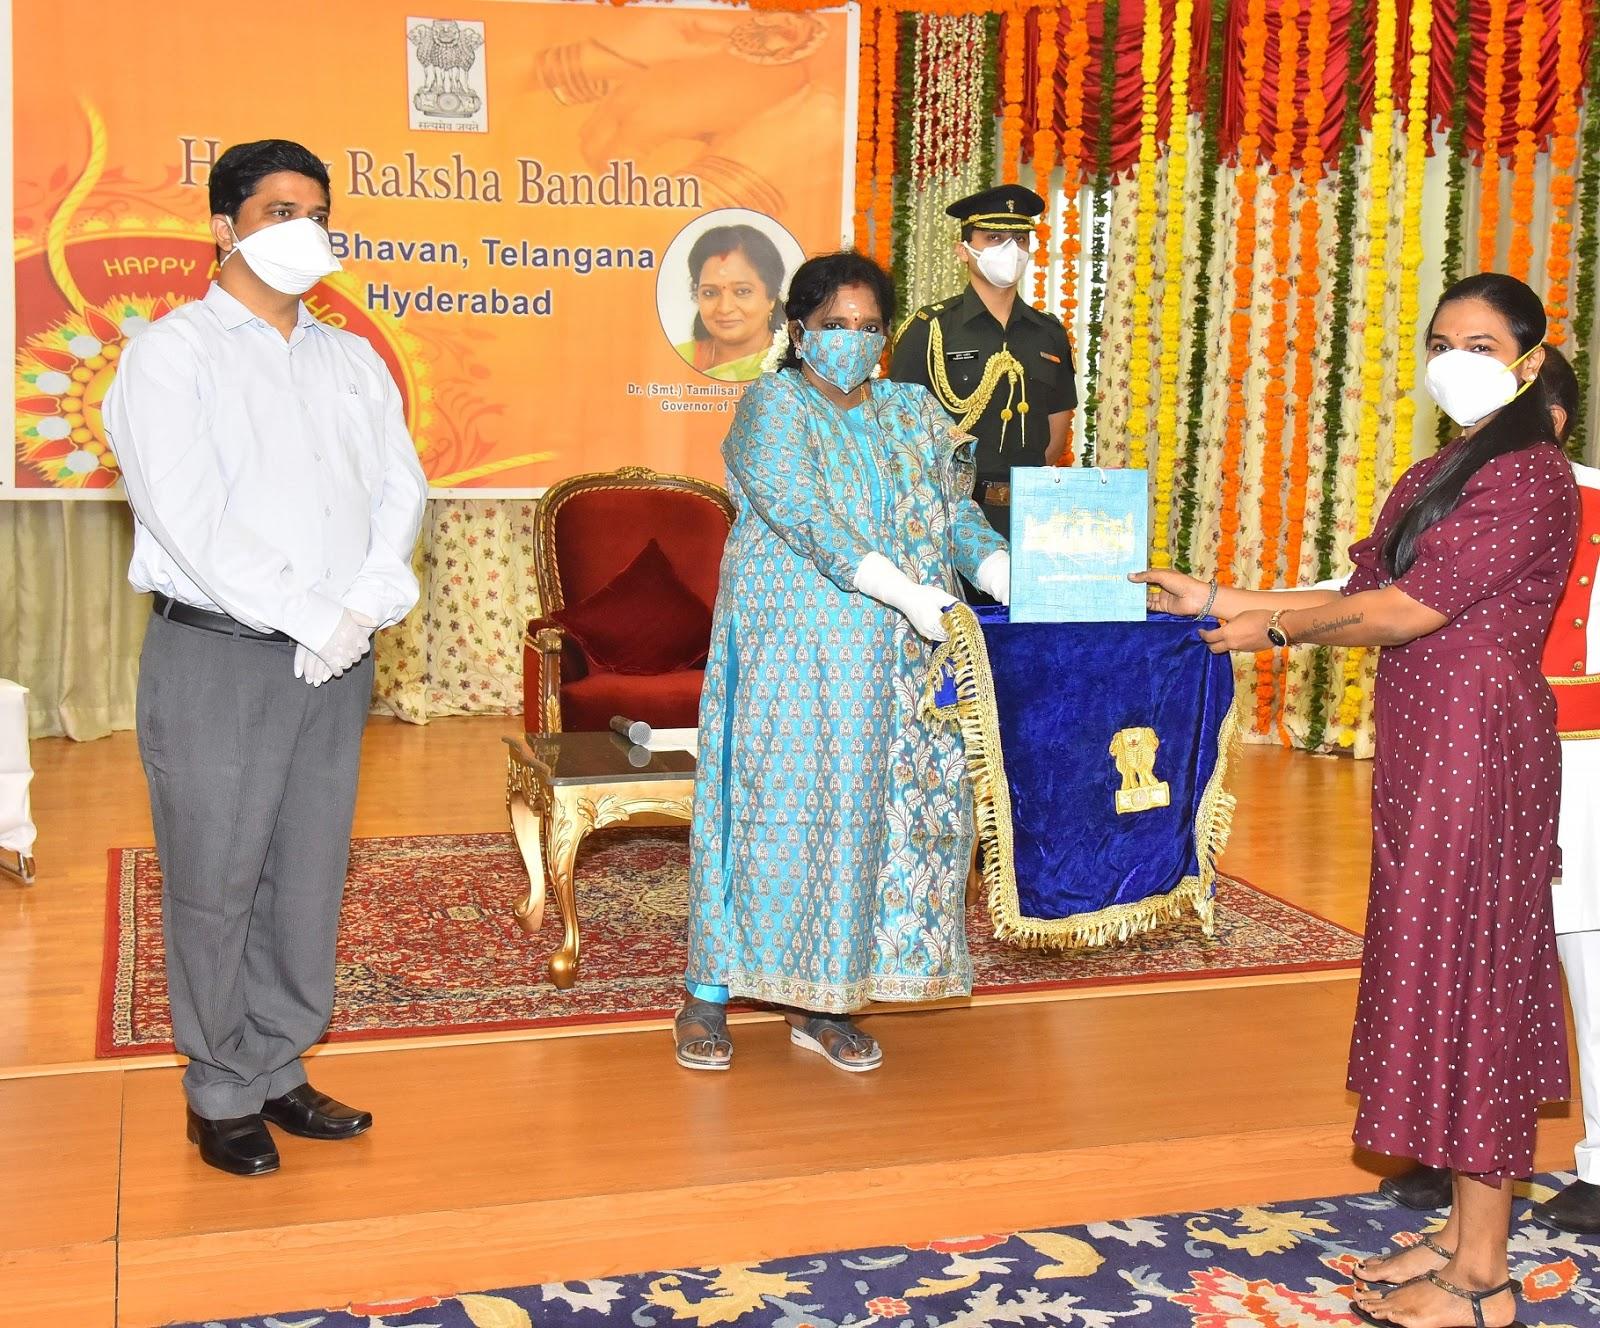 Telangana Governor celebrates Raksha Bandhan in a unique way with ...